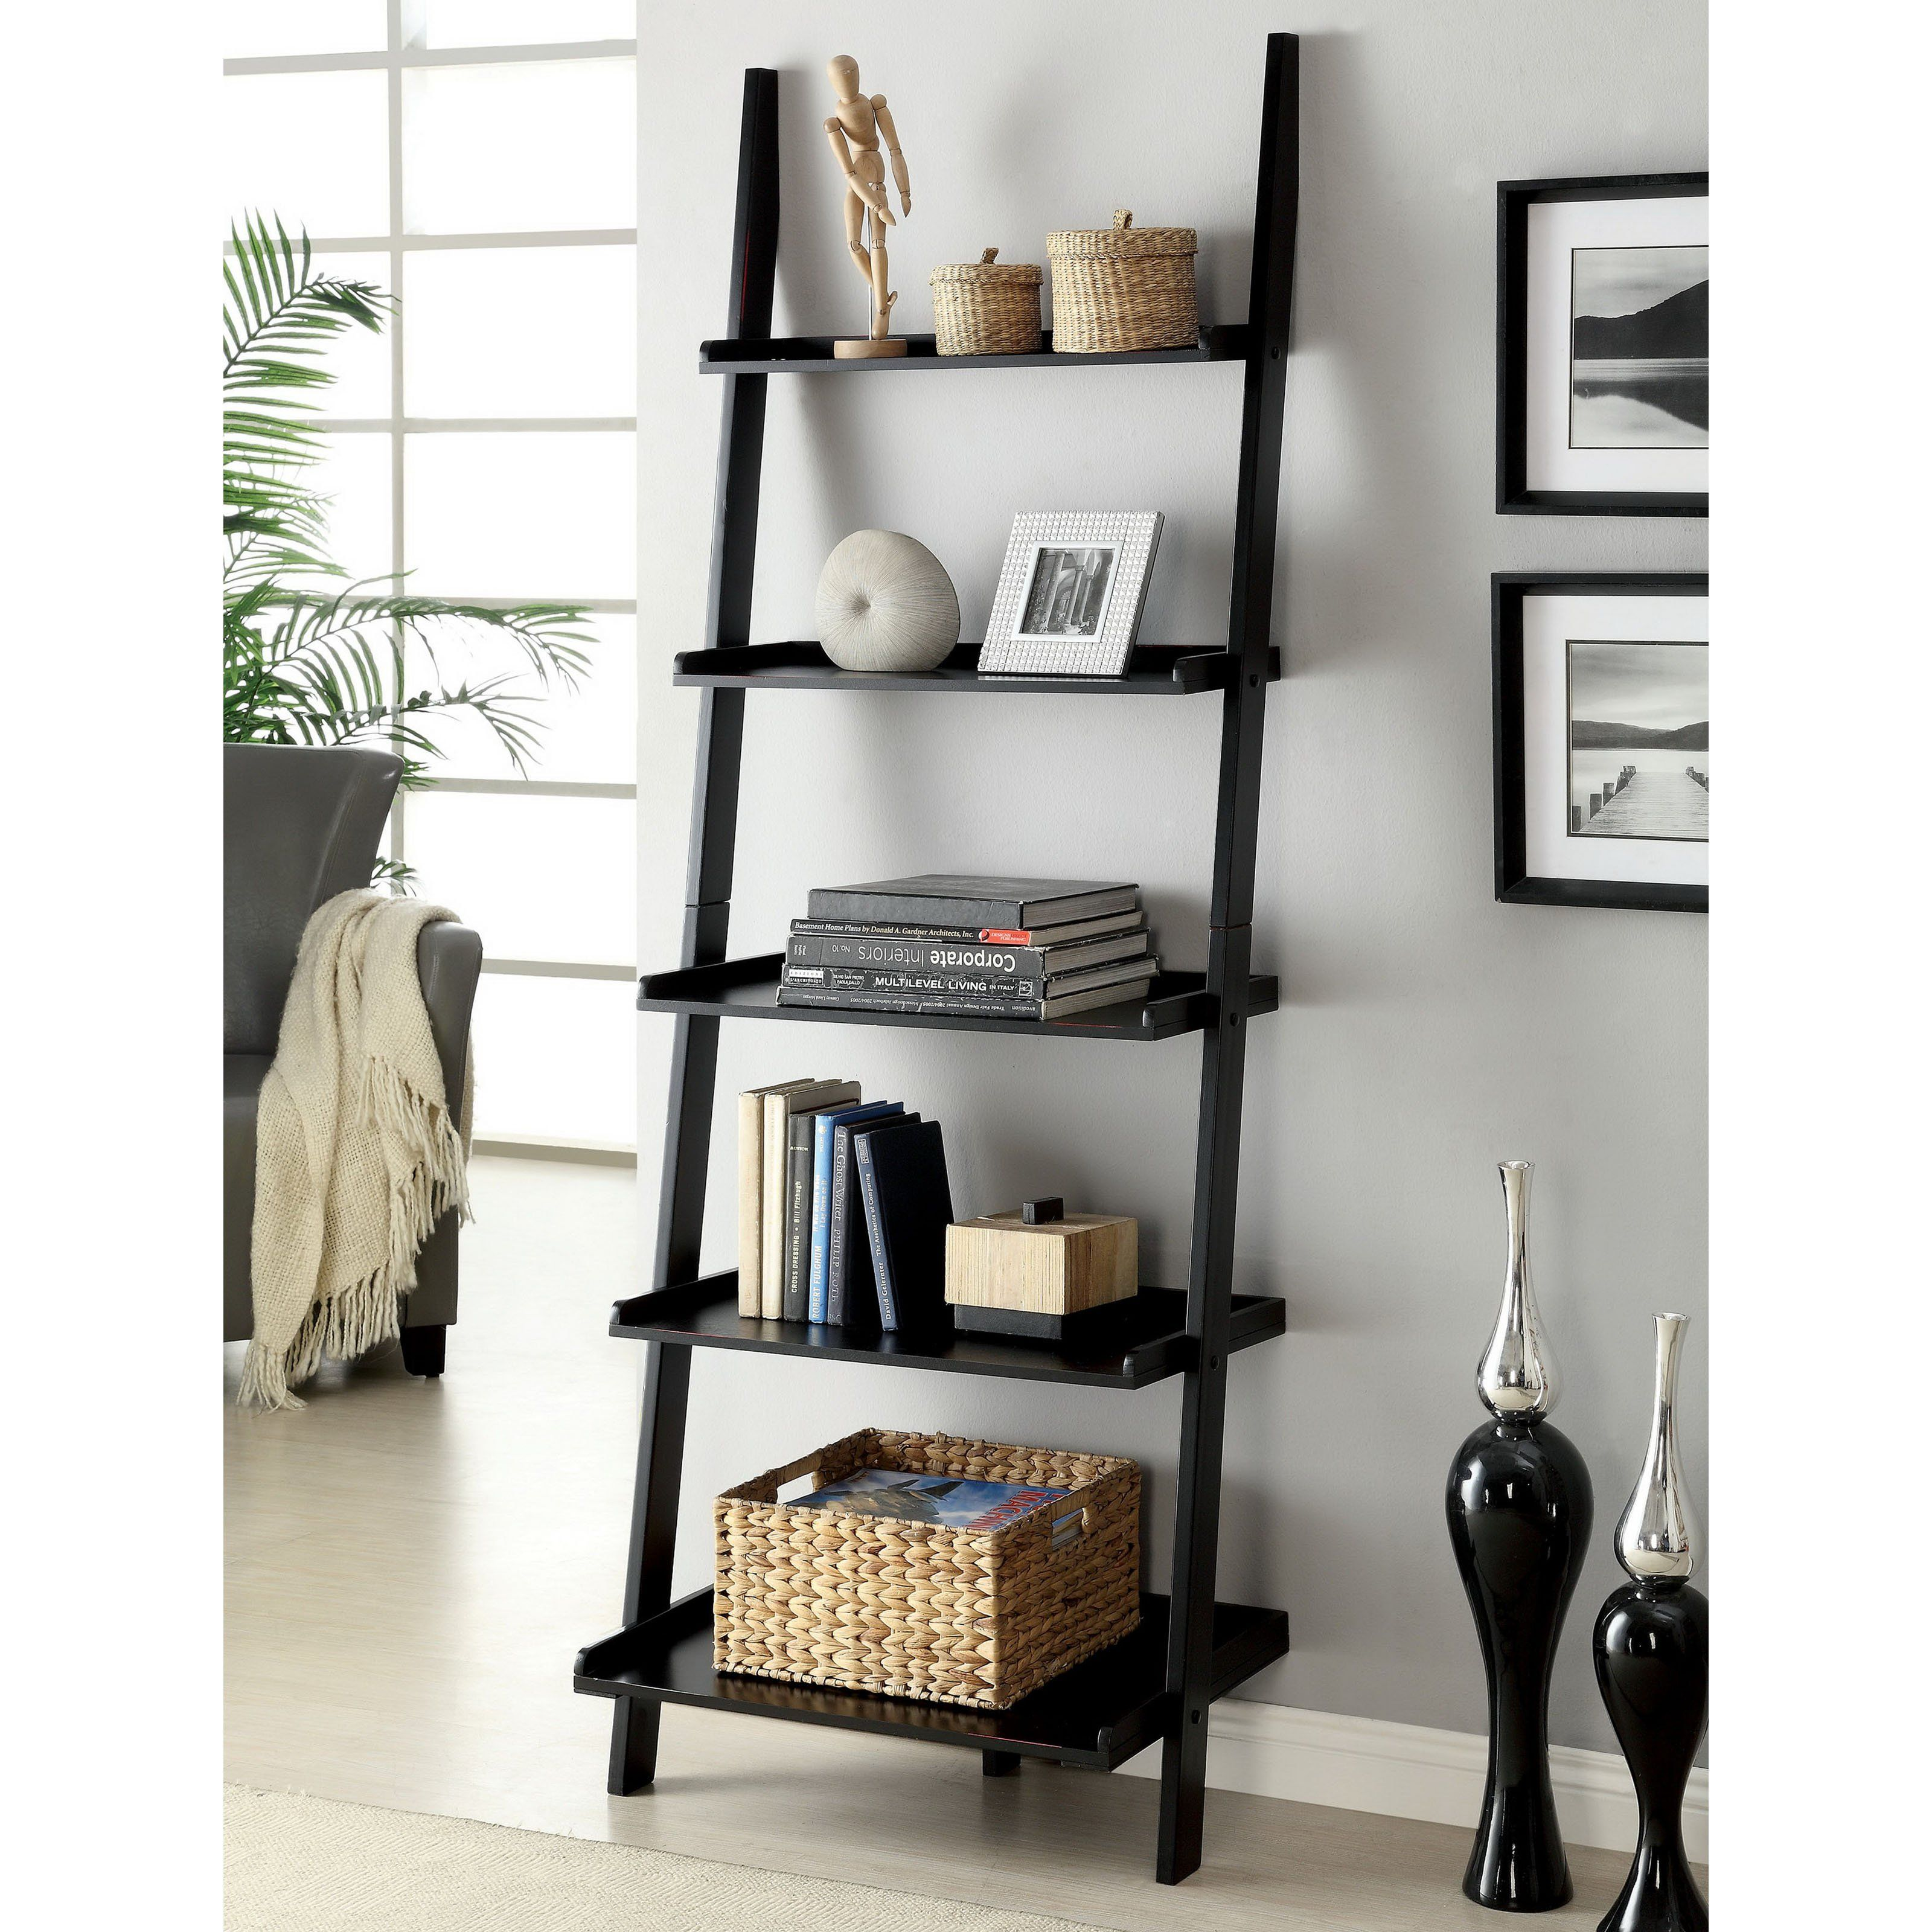 Bookshelf Decorating Ideas, Bookshelf Decorating Ideas Living Room,  Bookshelf Decorating Ideas Rustic, Bookshelf Decorating Ideas Bedrooms.